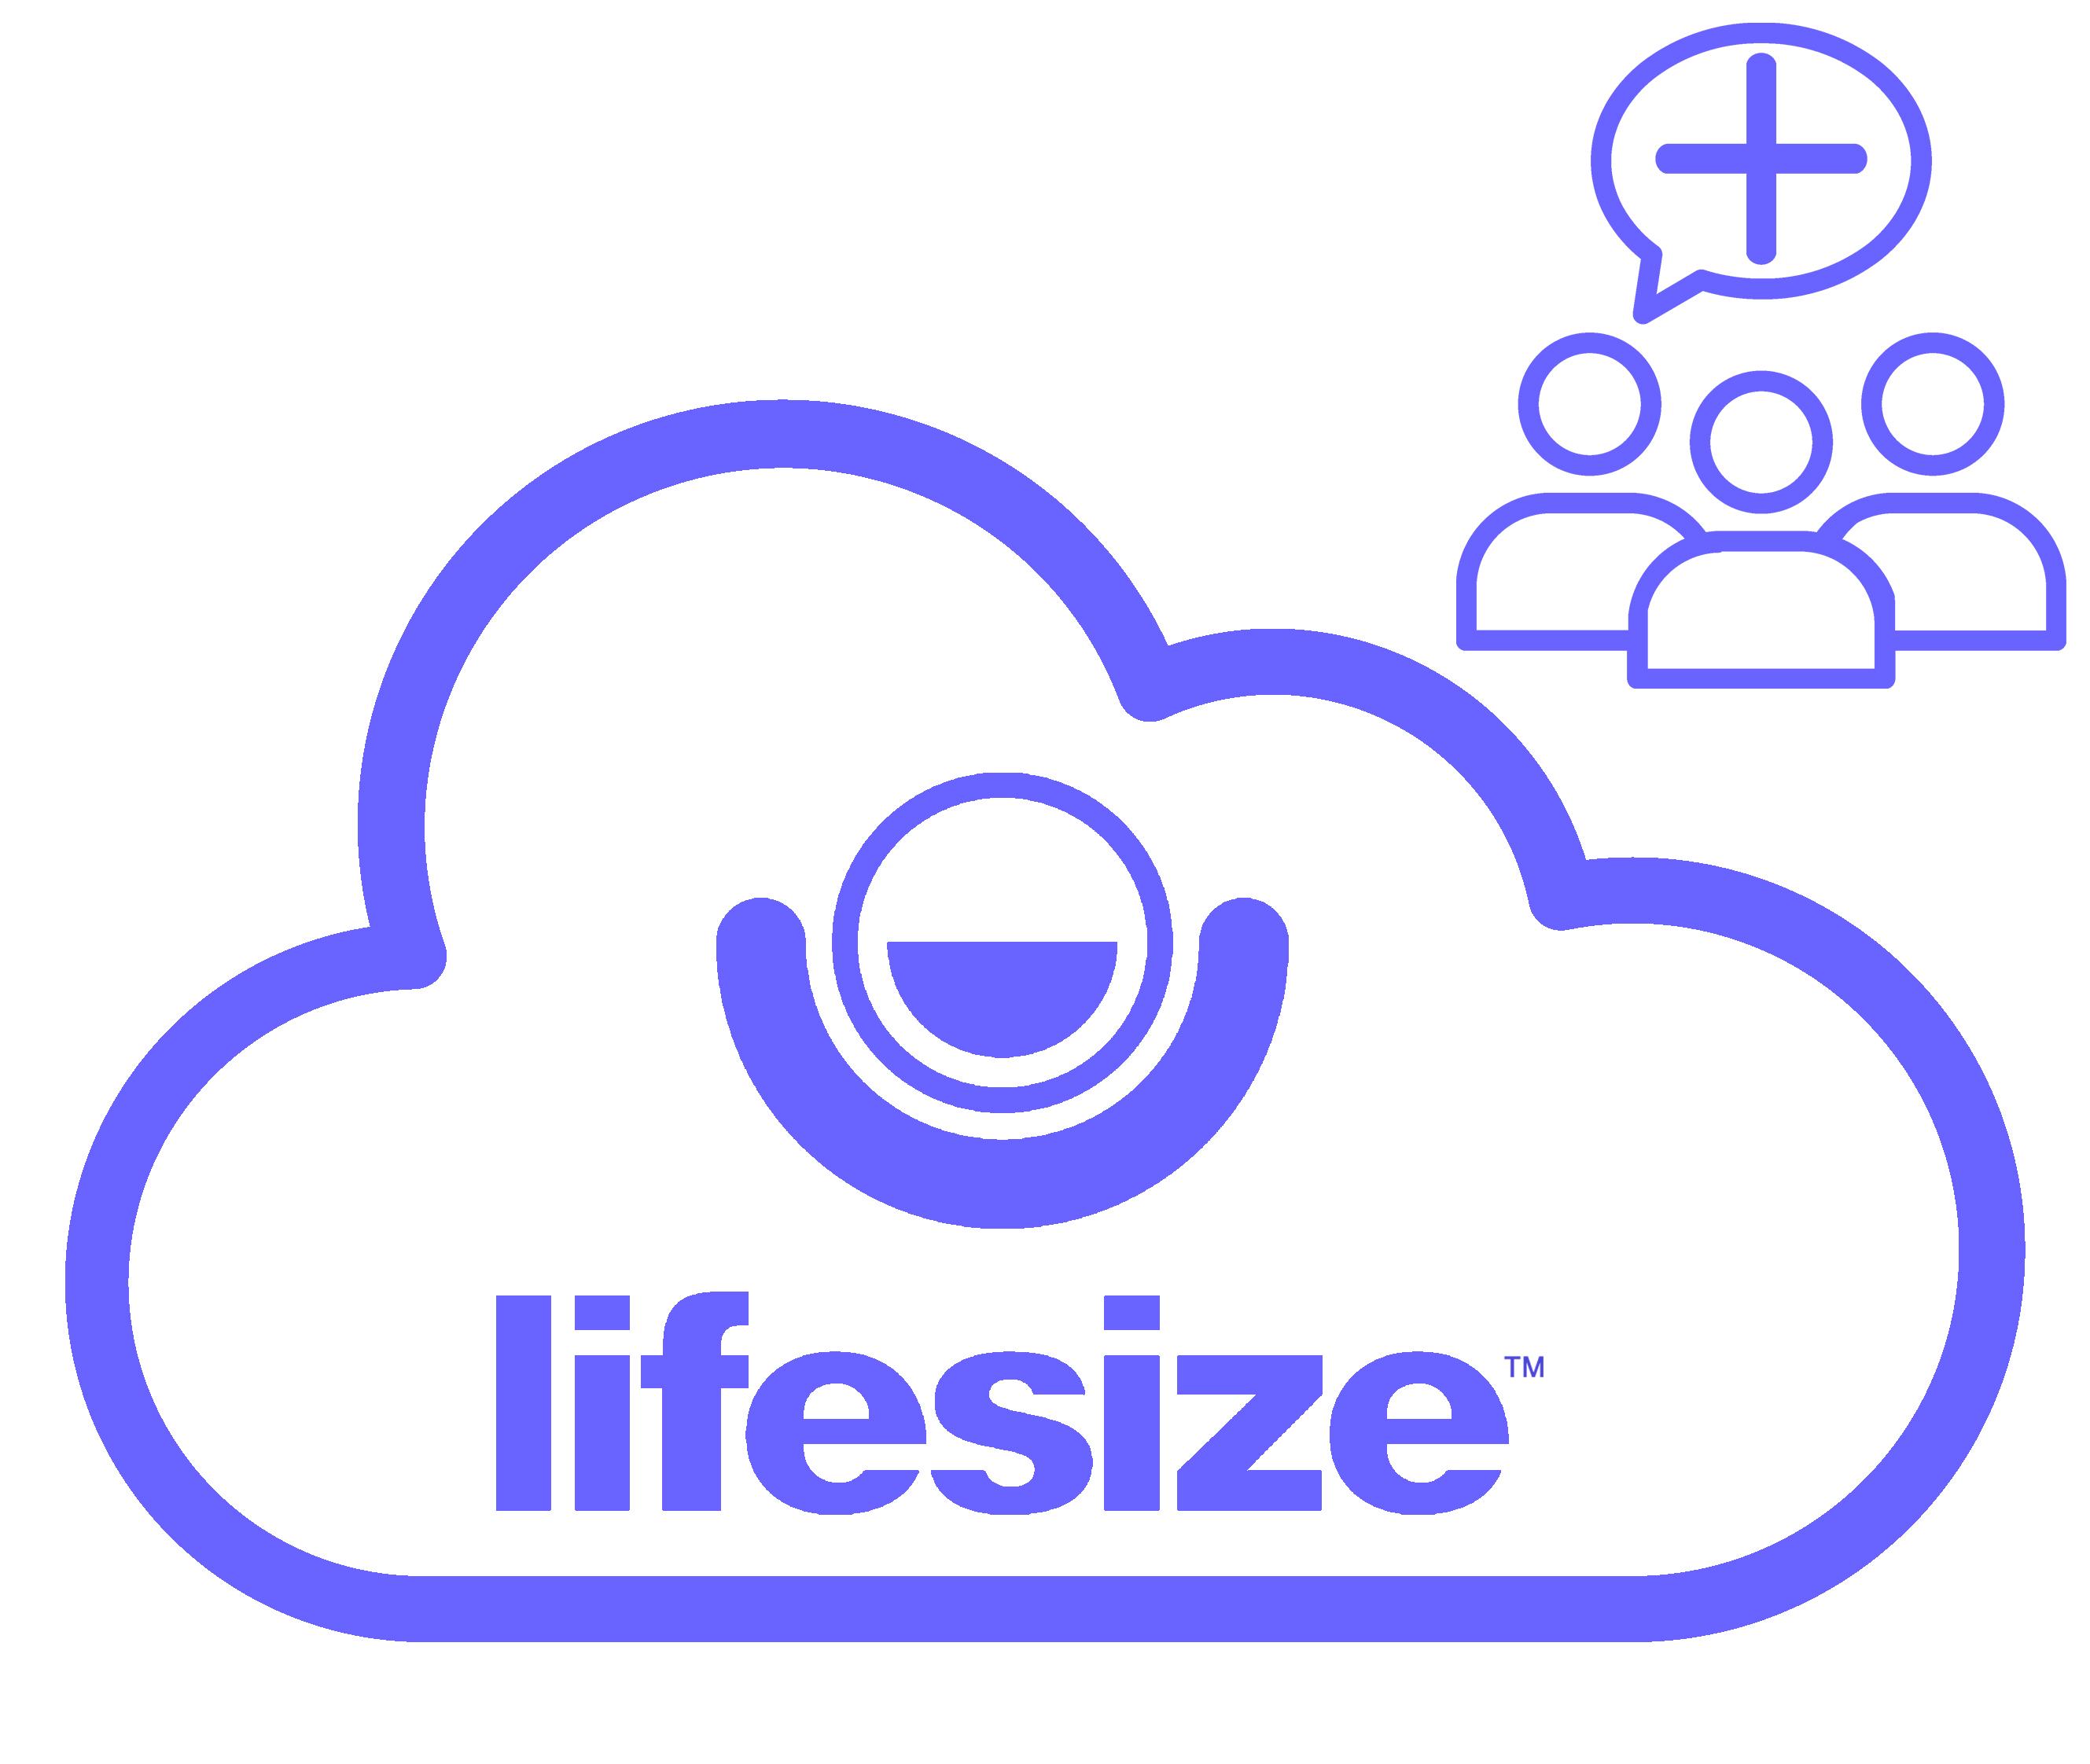 LIFESIZE Lifesize Virtual Meeting Room - Option de visioconférence Cloud